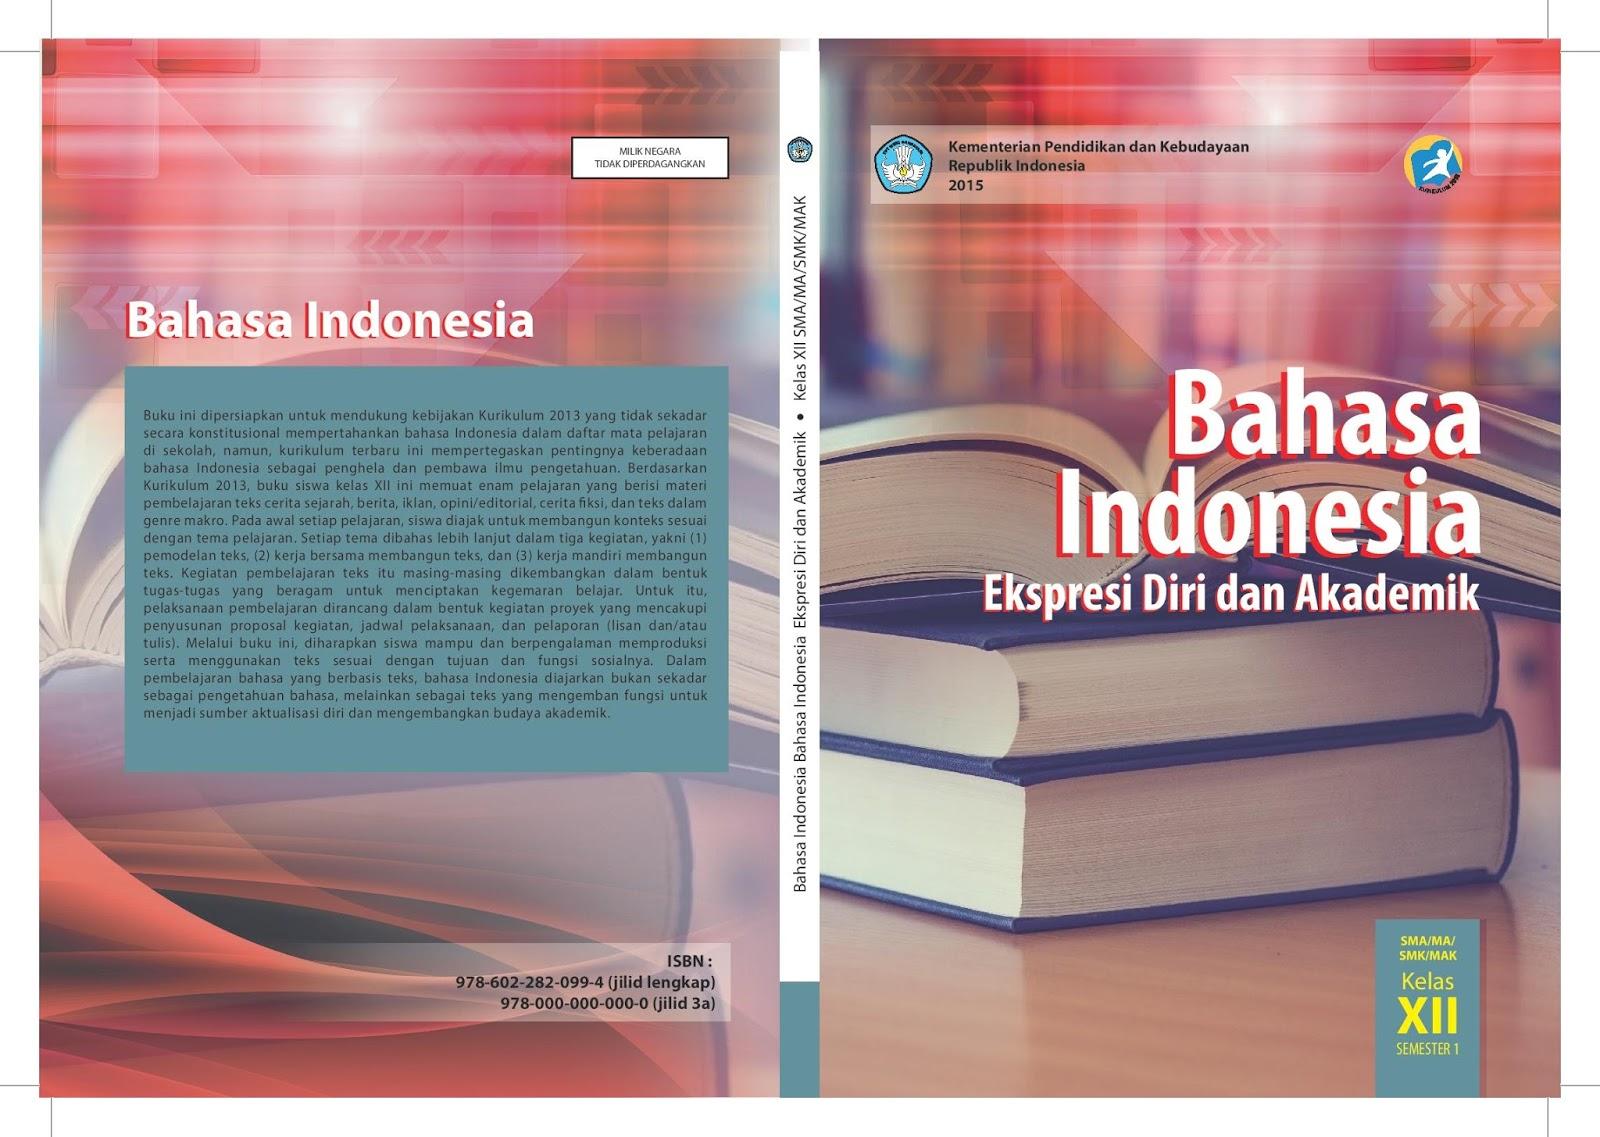 Kumpulan Seputar Apa Saja Jawaban Bahasa Indonesia Kelas Xii Semester 1 Halaman 64 65